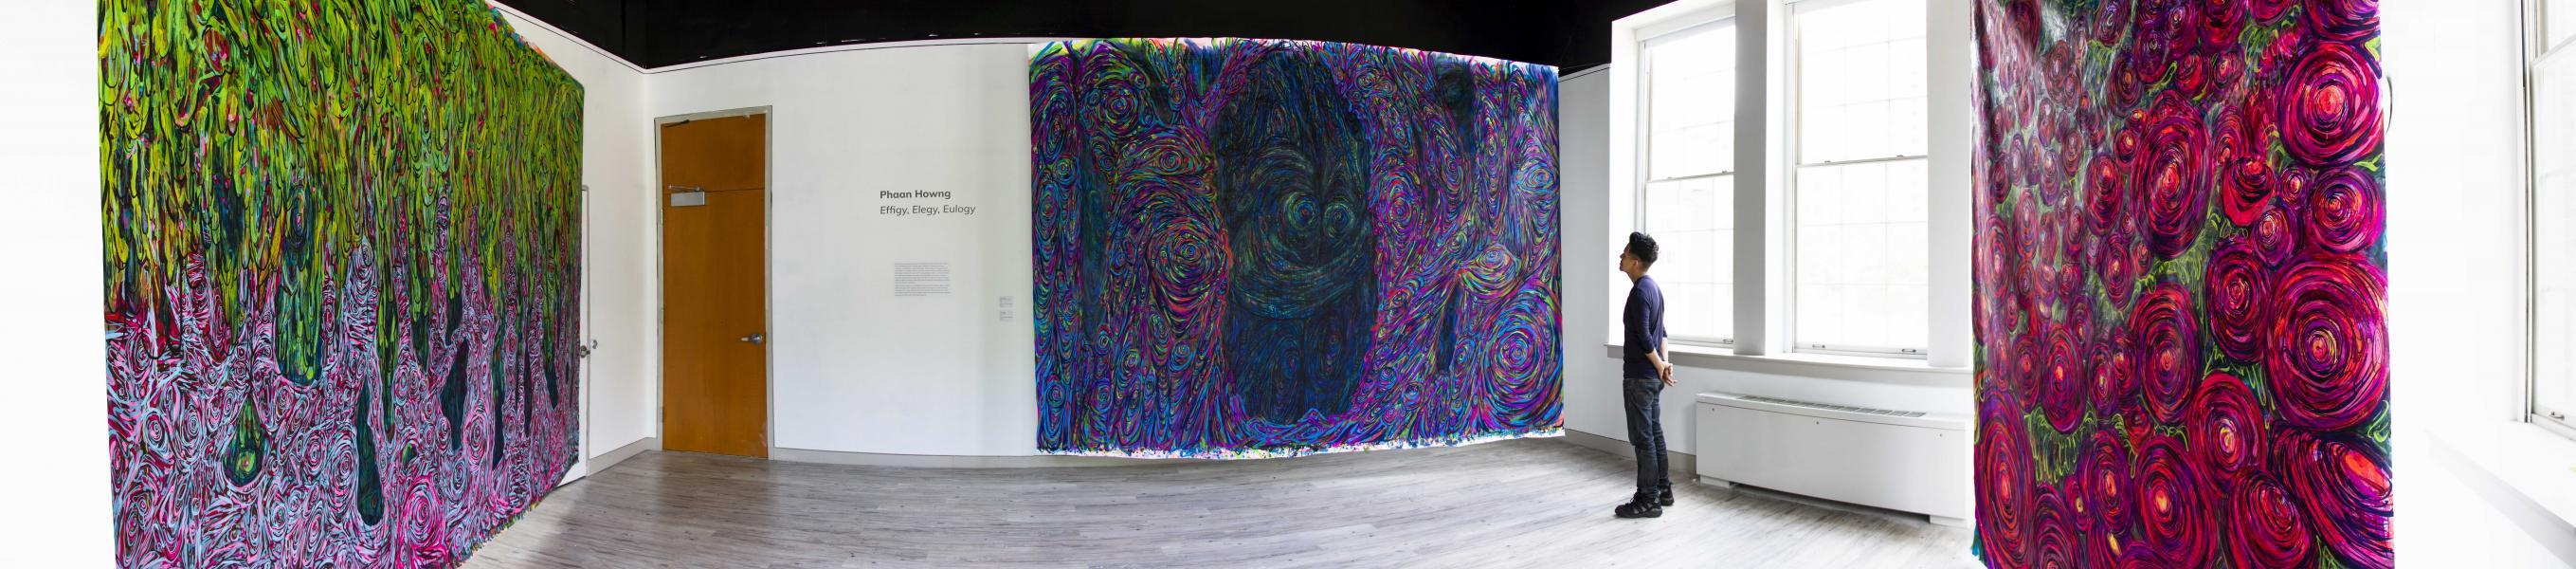 installation, painting